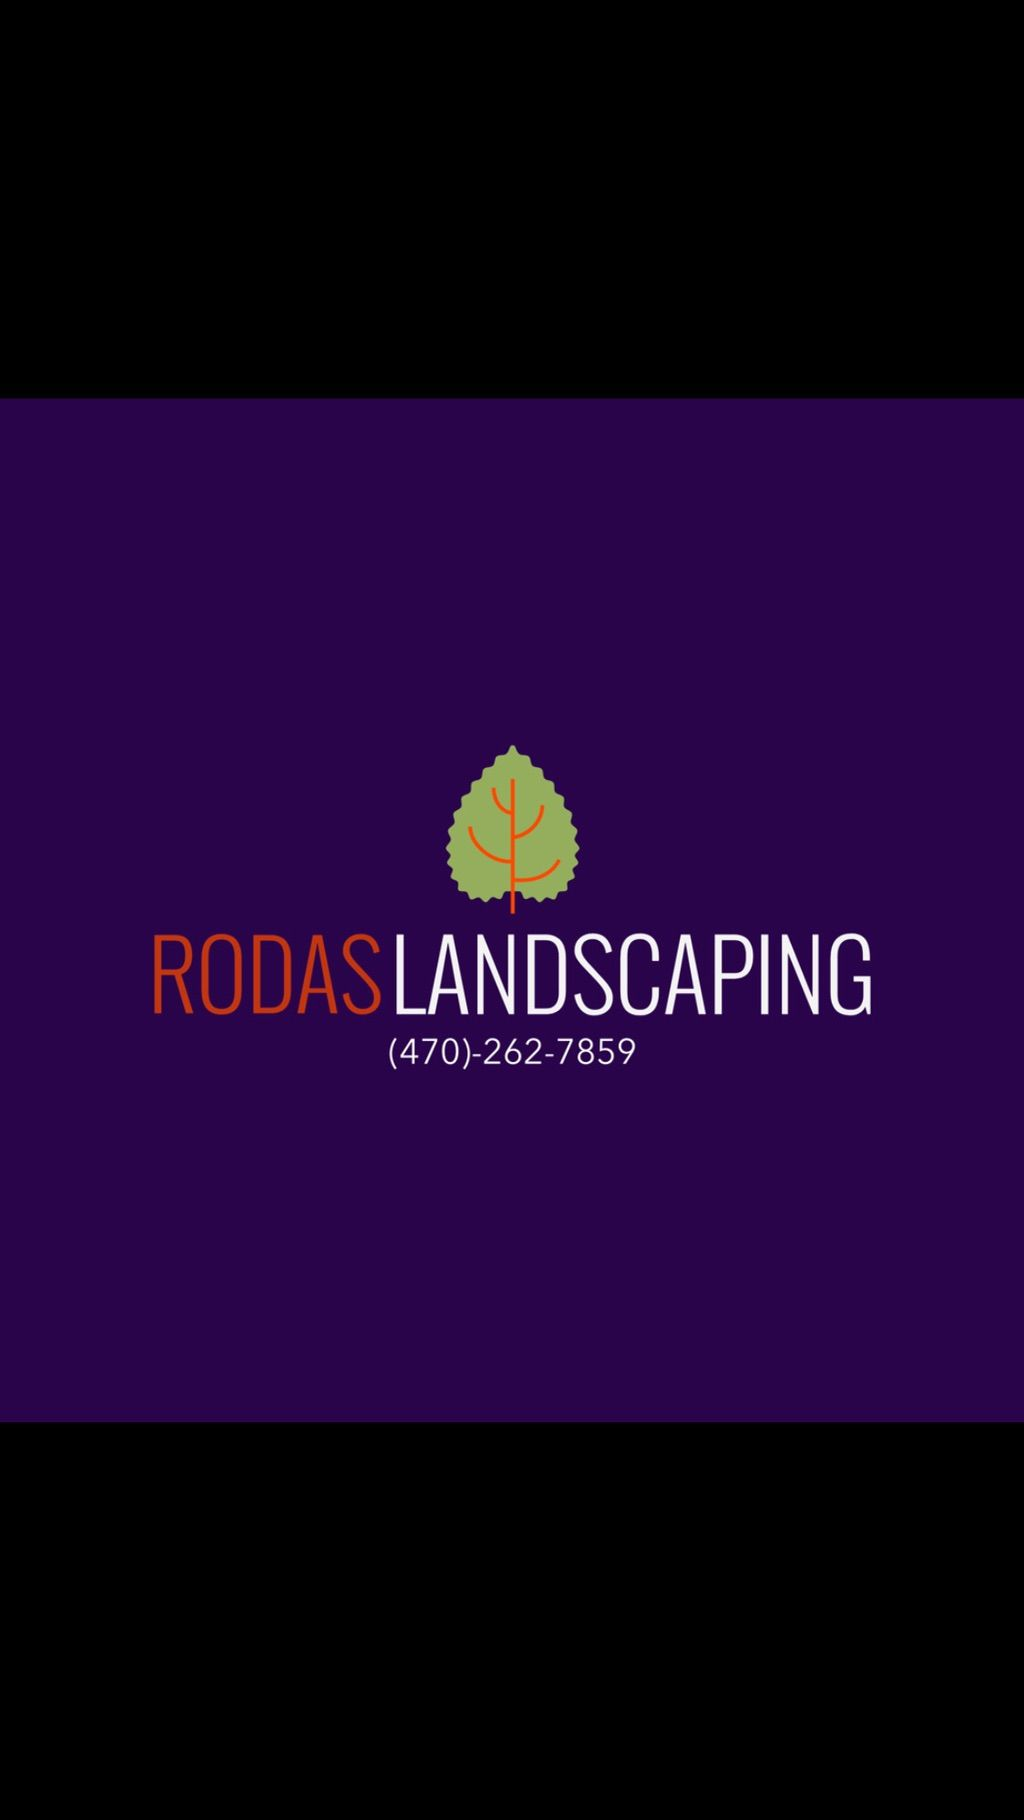 Rodas landscaping